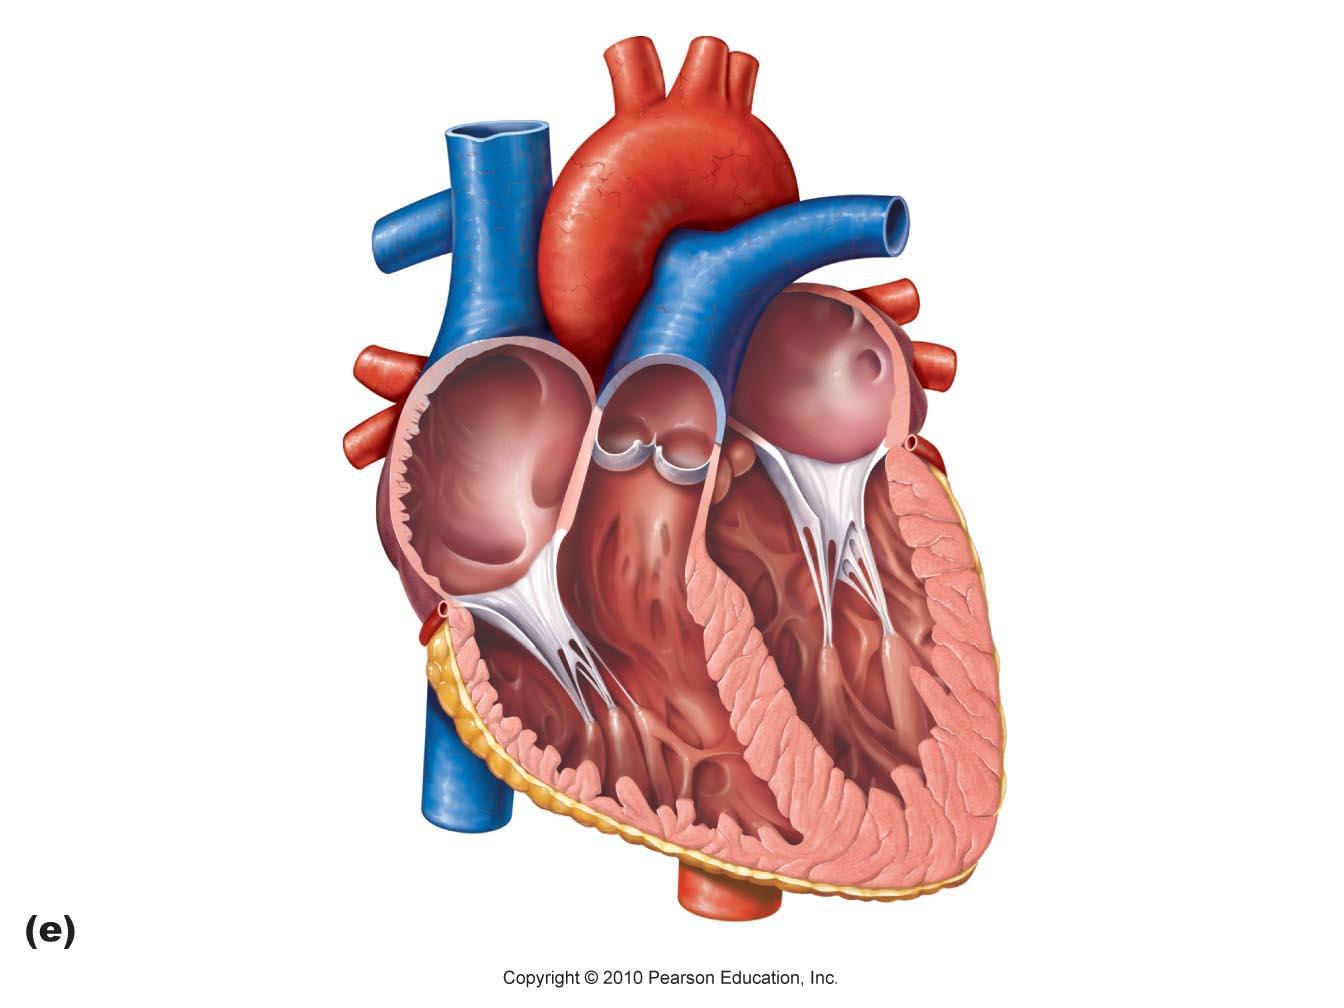 worksheet Structure Of The Heart Worksheet imagequiz heart structures